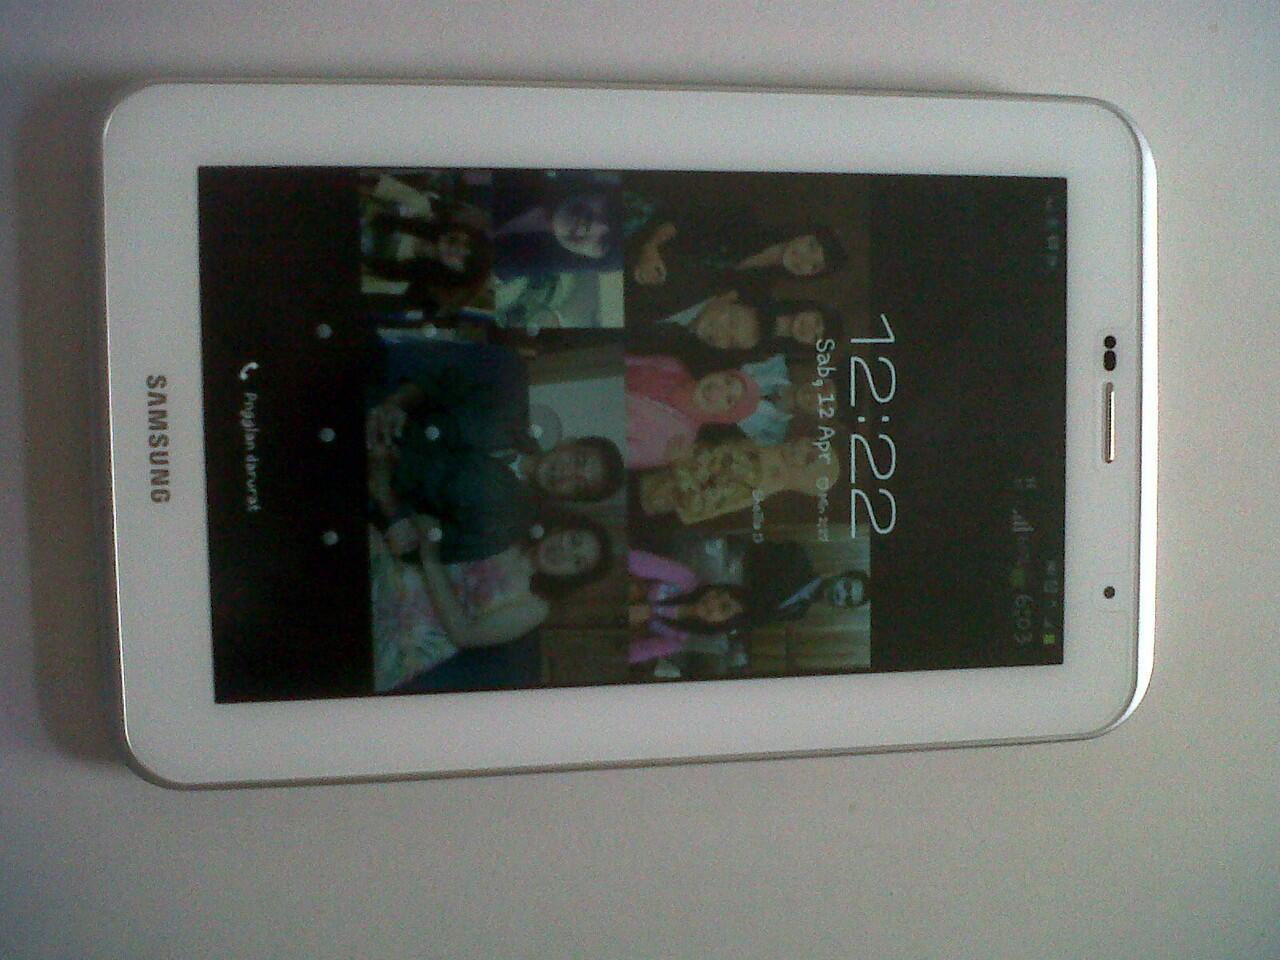 Samsung Galaxy Tab 2 7.0 P3100 warna putih